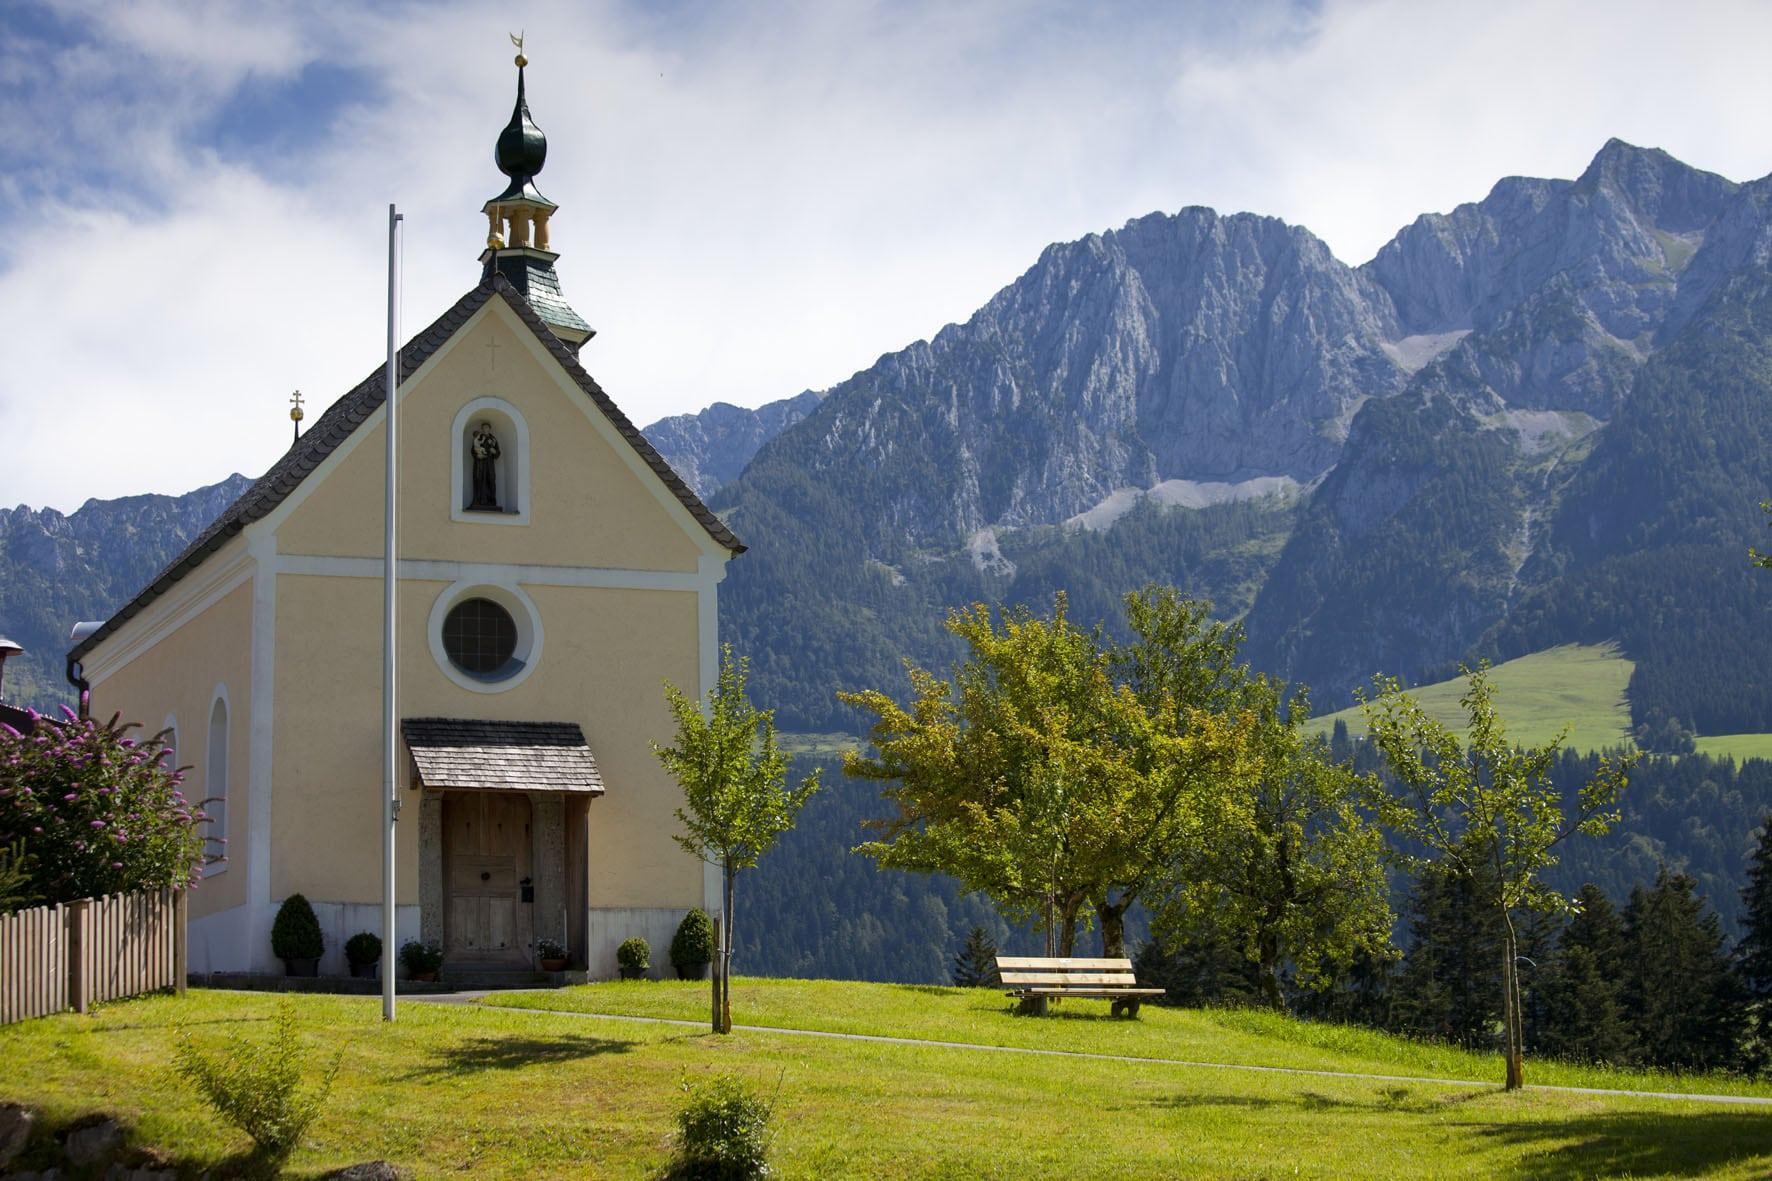 Kapelle im Kaiserwinkl